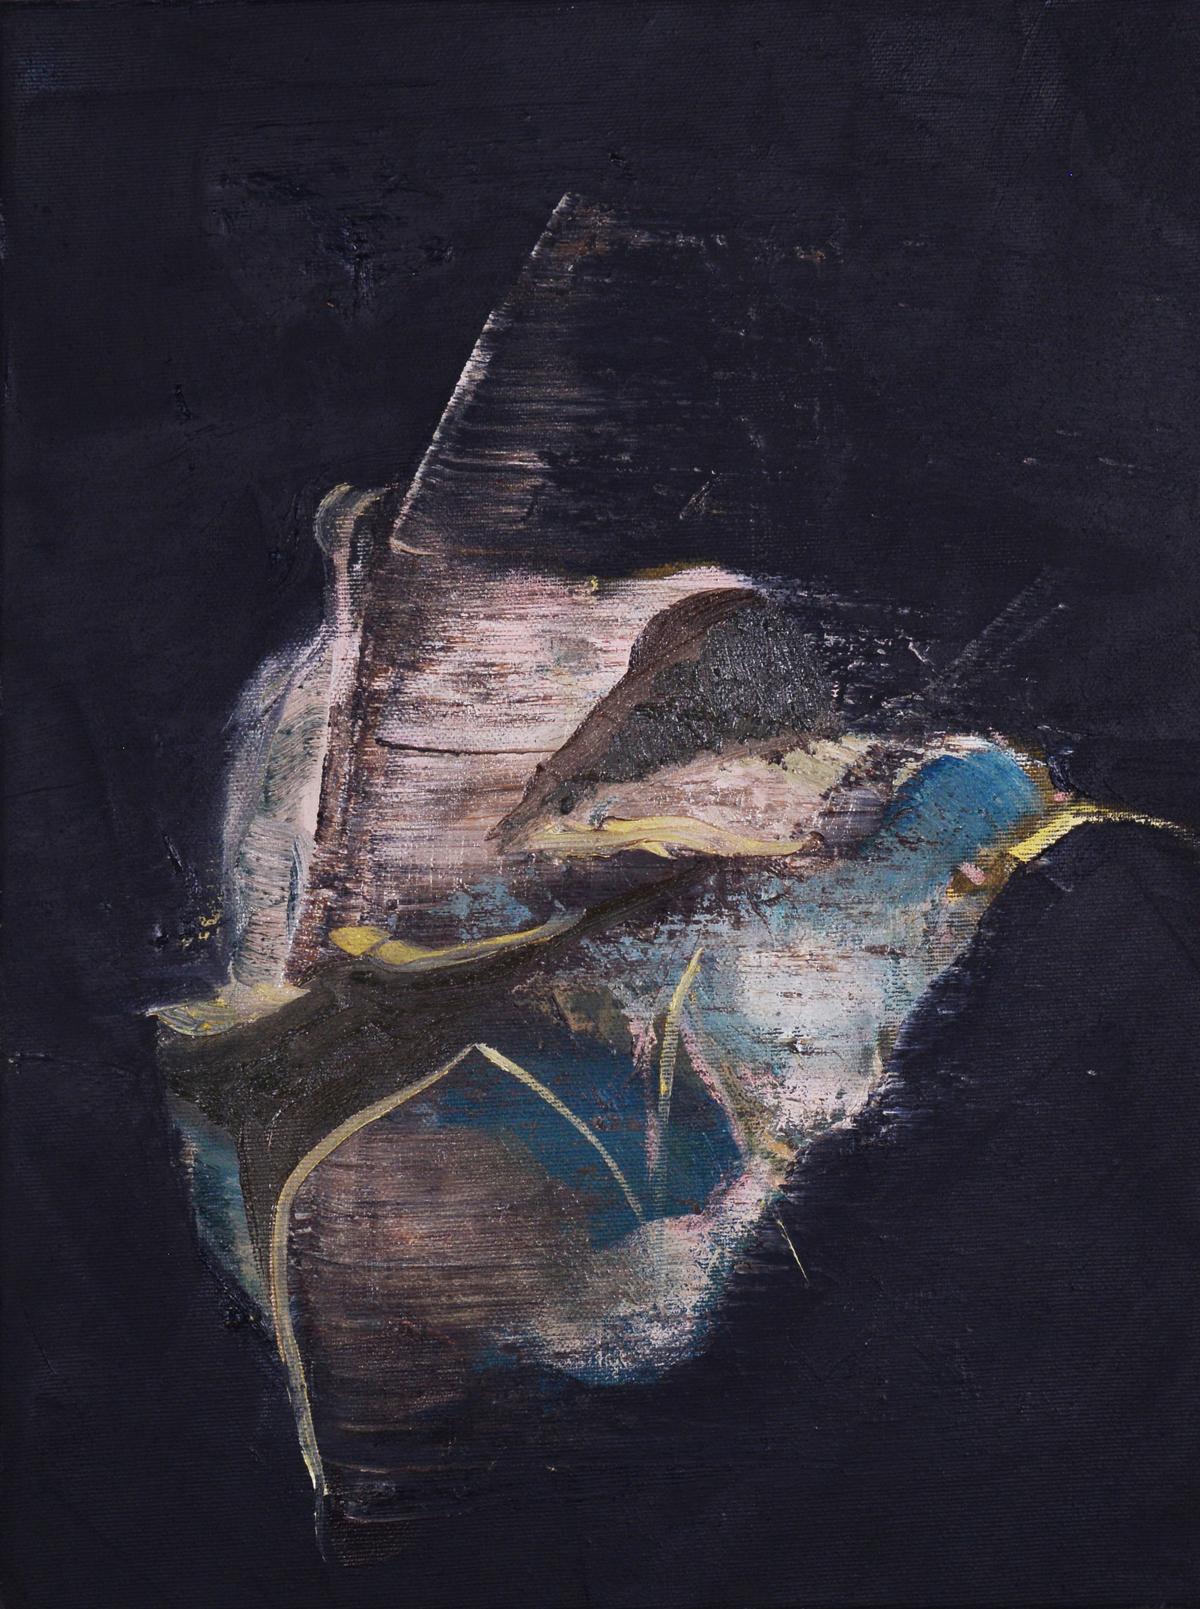 Flight, 2013, Oil on reversed black primed canvas, 40 x 30 cm